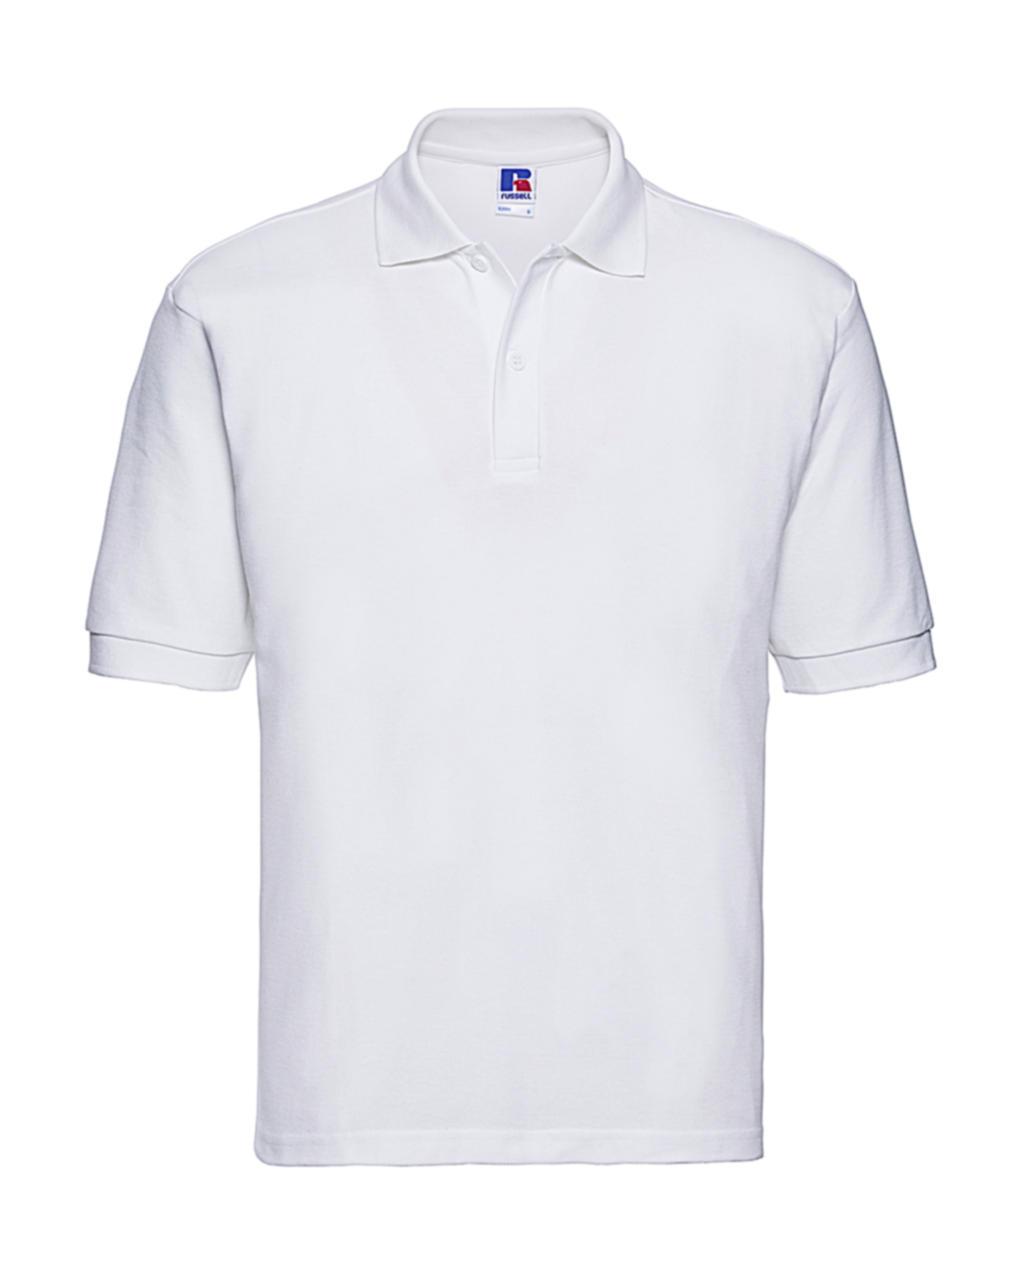 JZ Polo-Shirt 65% Polyester, 35% ringspu